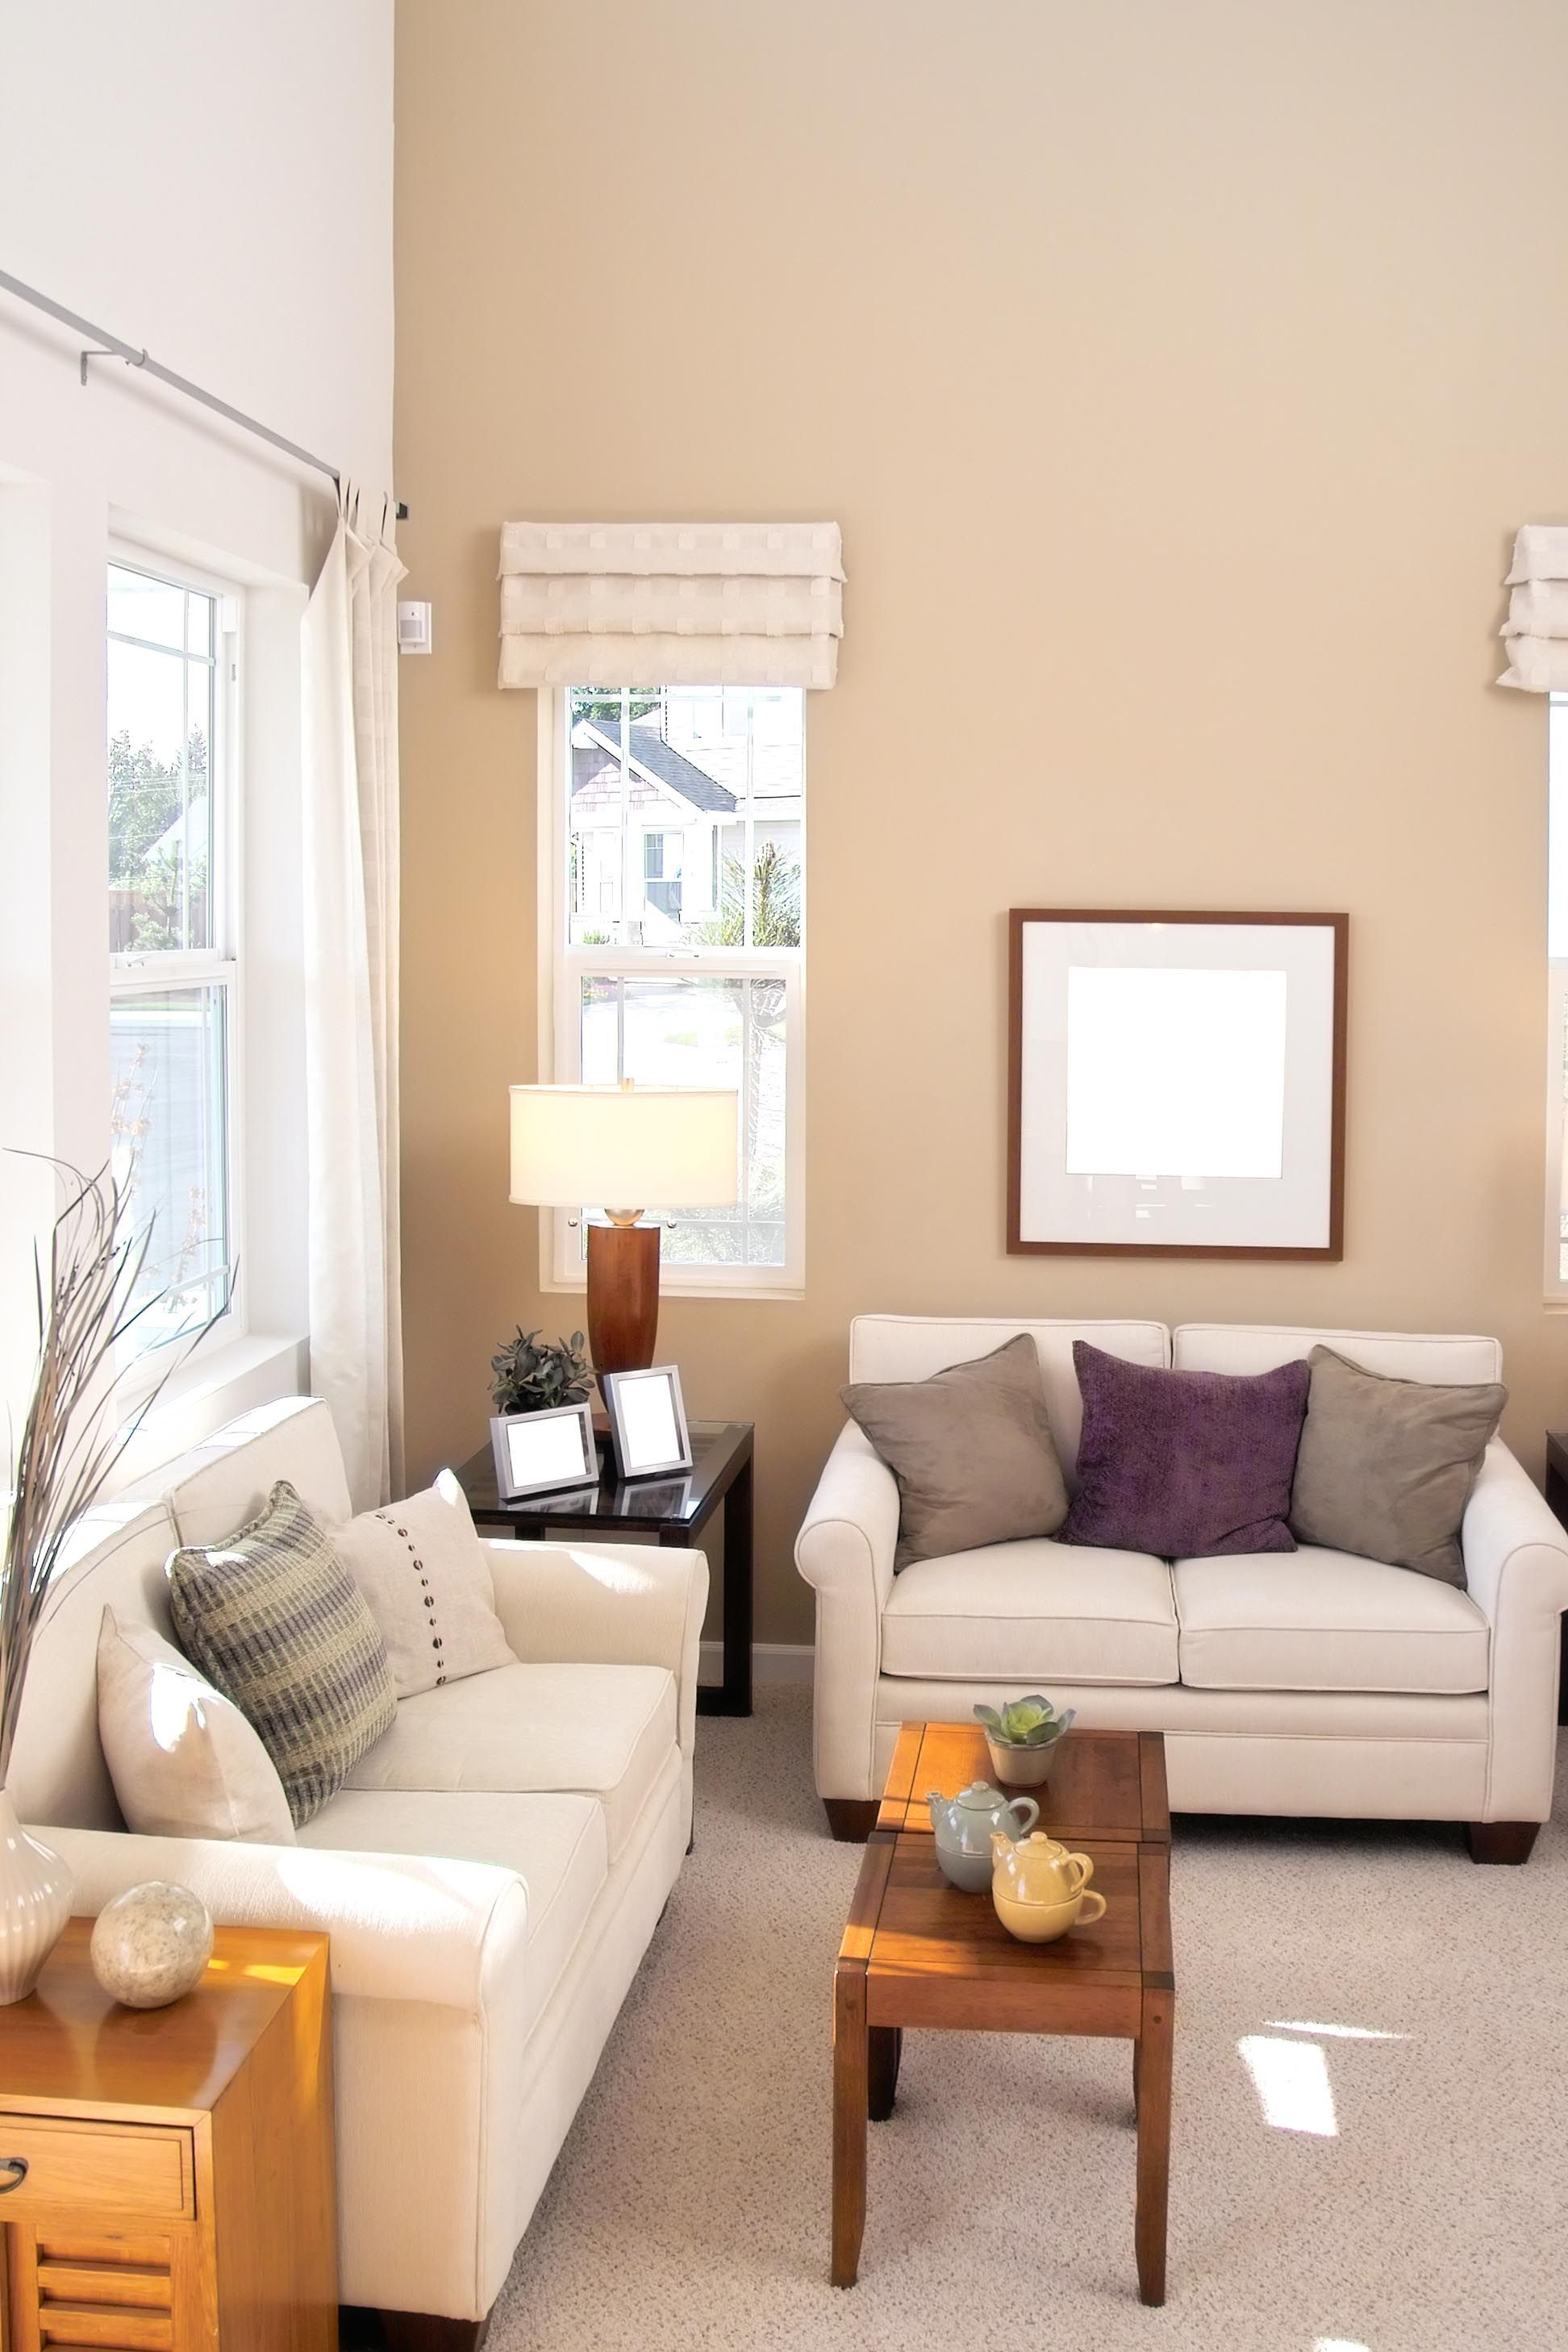 Furniture Interior Designers Don\u0027t Like - Designers\u0027 Least ...